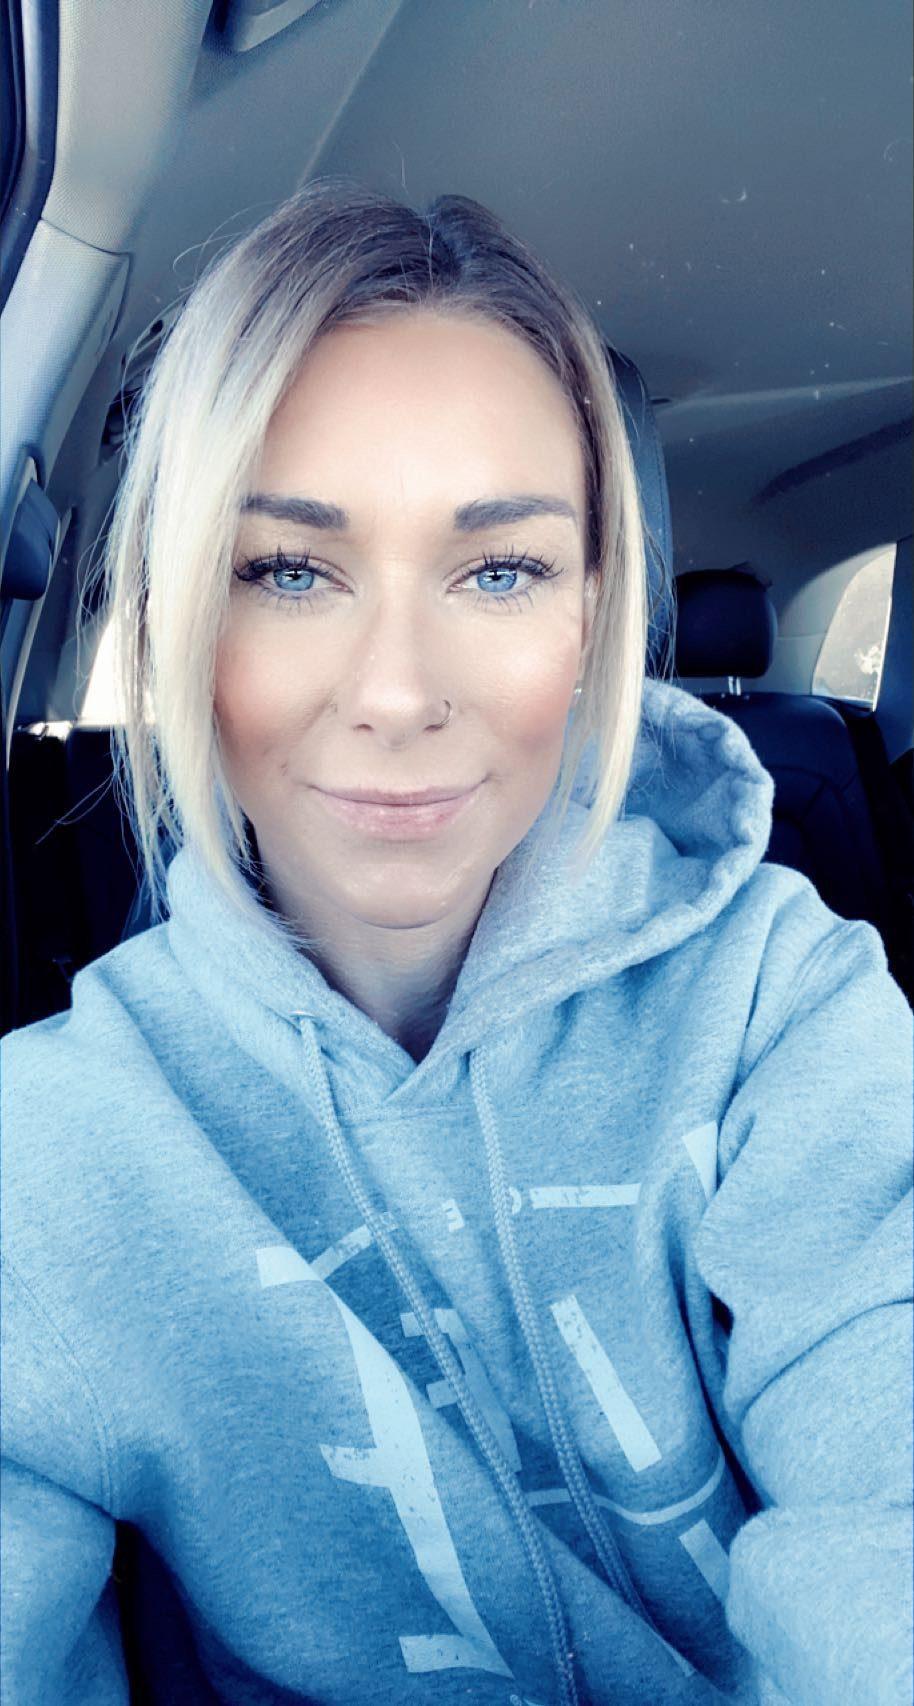 Personal Trainer Erie, Colorado - Molly Smith (Rose)